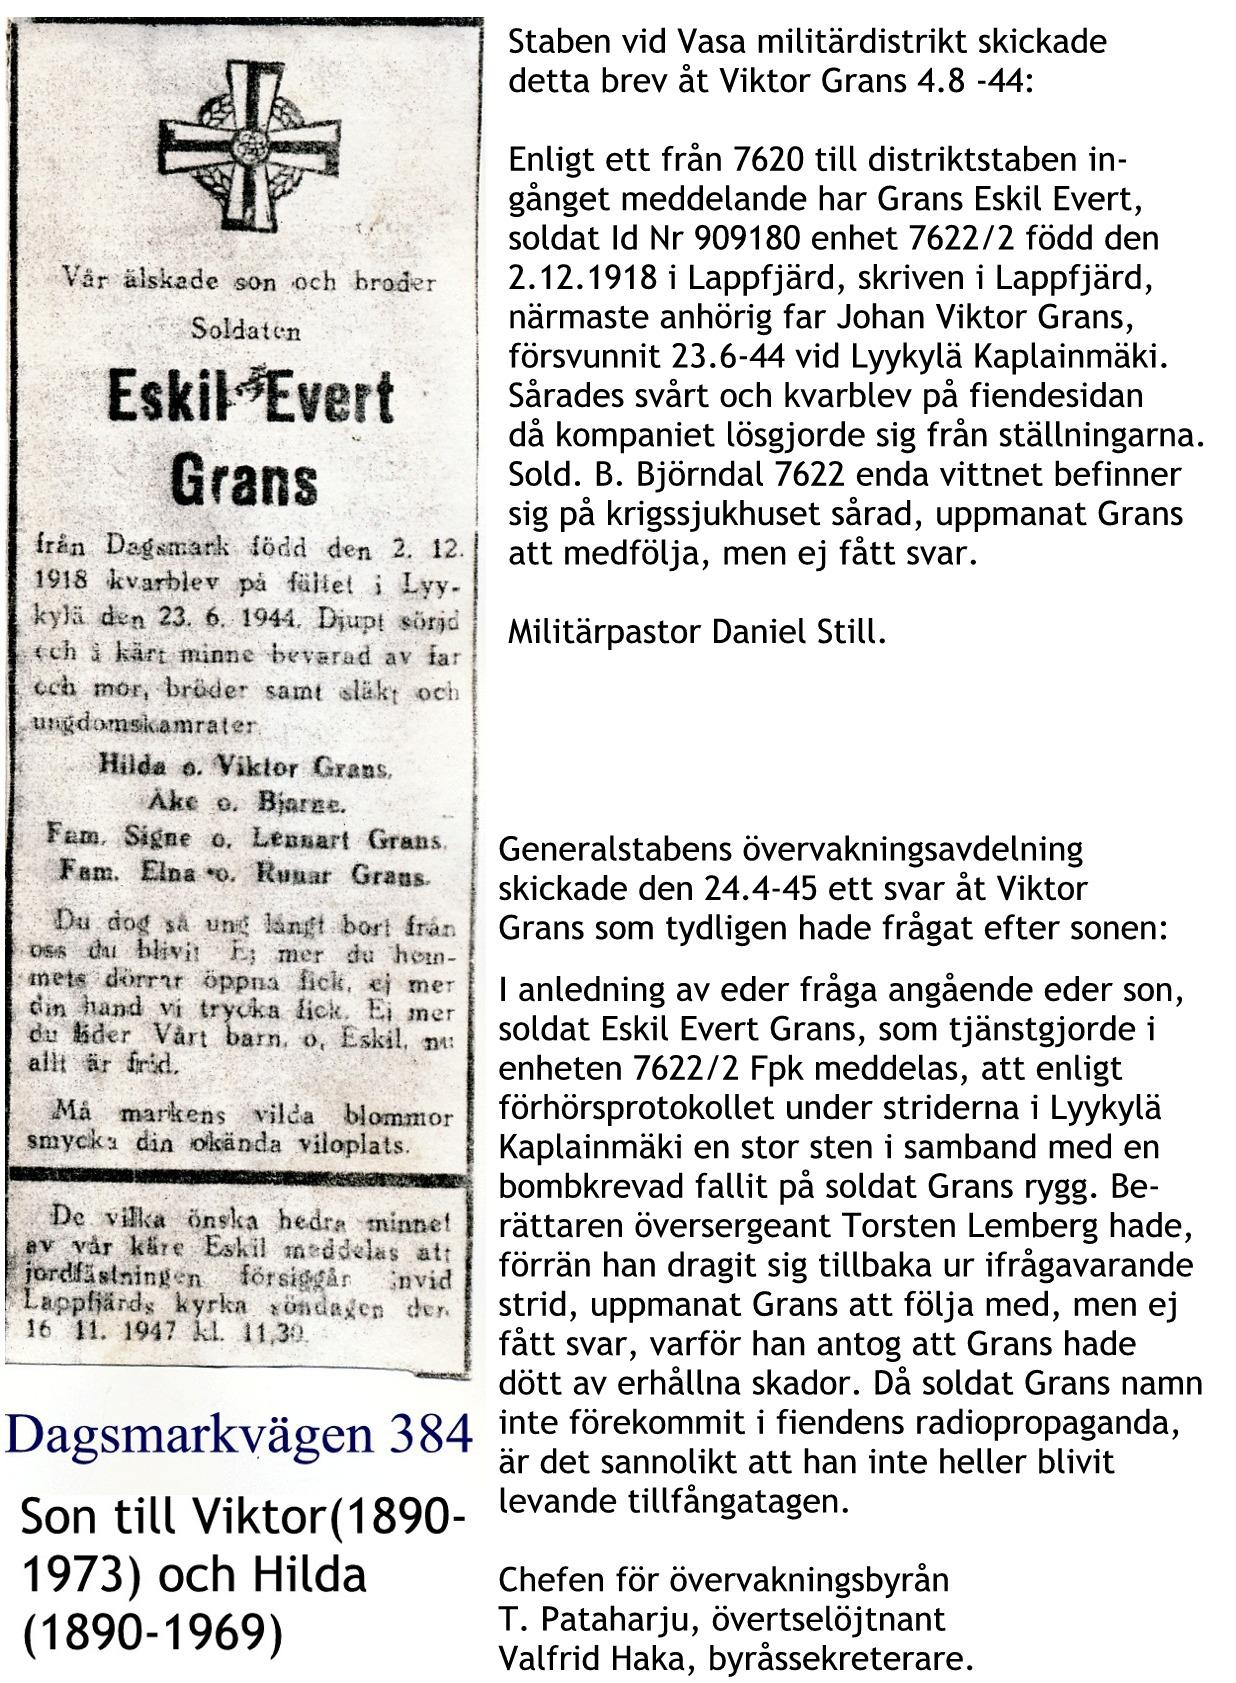 Grans Eskil Evert